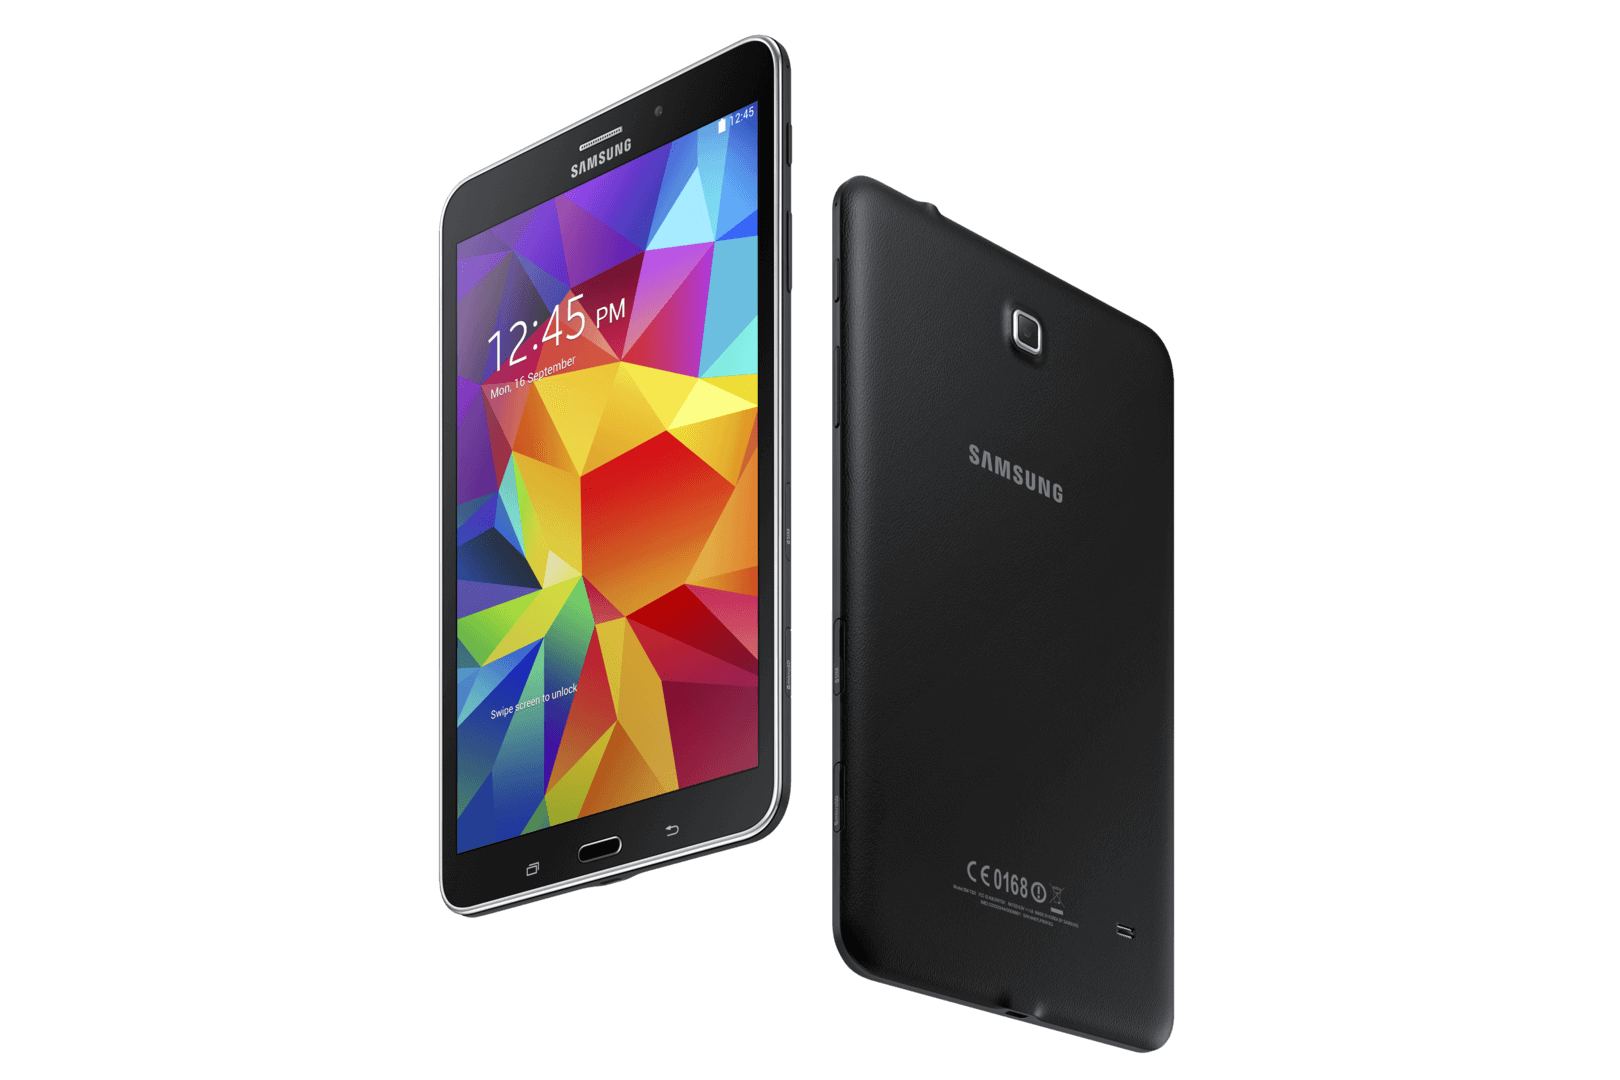 Ремонт Samsung Galaxy 4 8.0 SM-T330